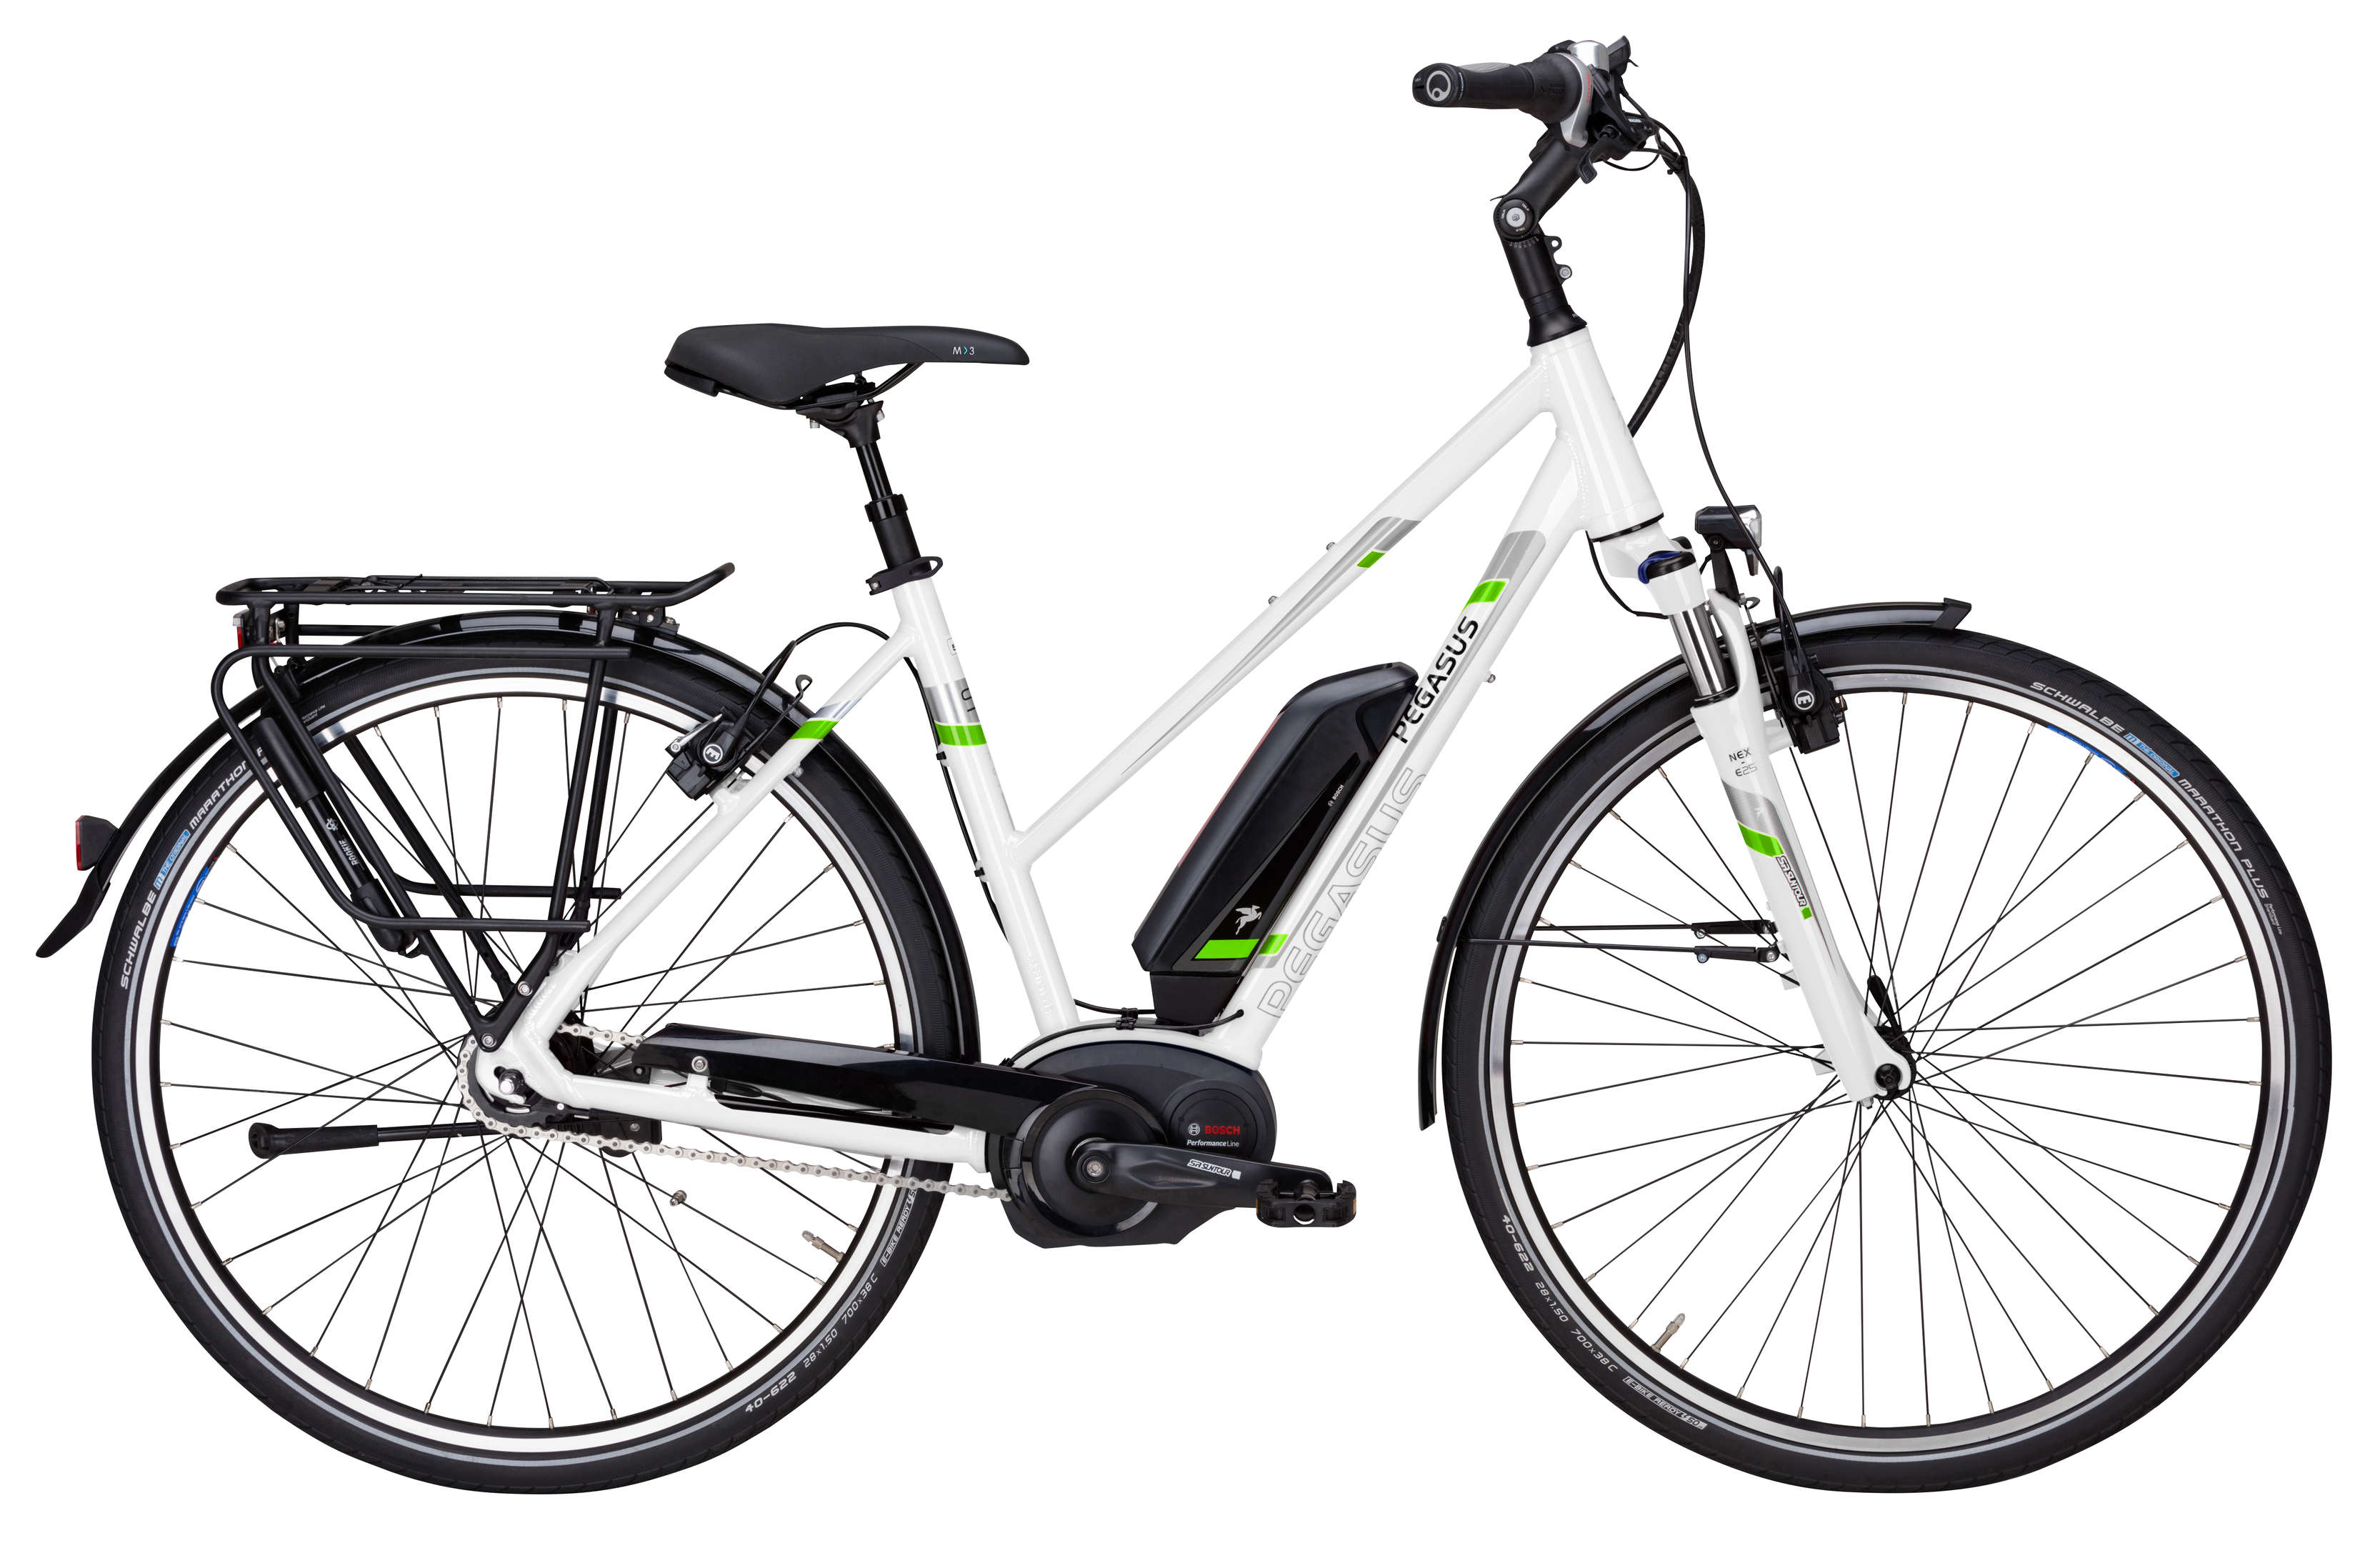 pegasus e bike premio e8r eurorad bikeleasingeurorad. Black Bedroom Furniture Sets. Home Design Ideas